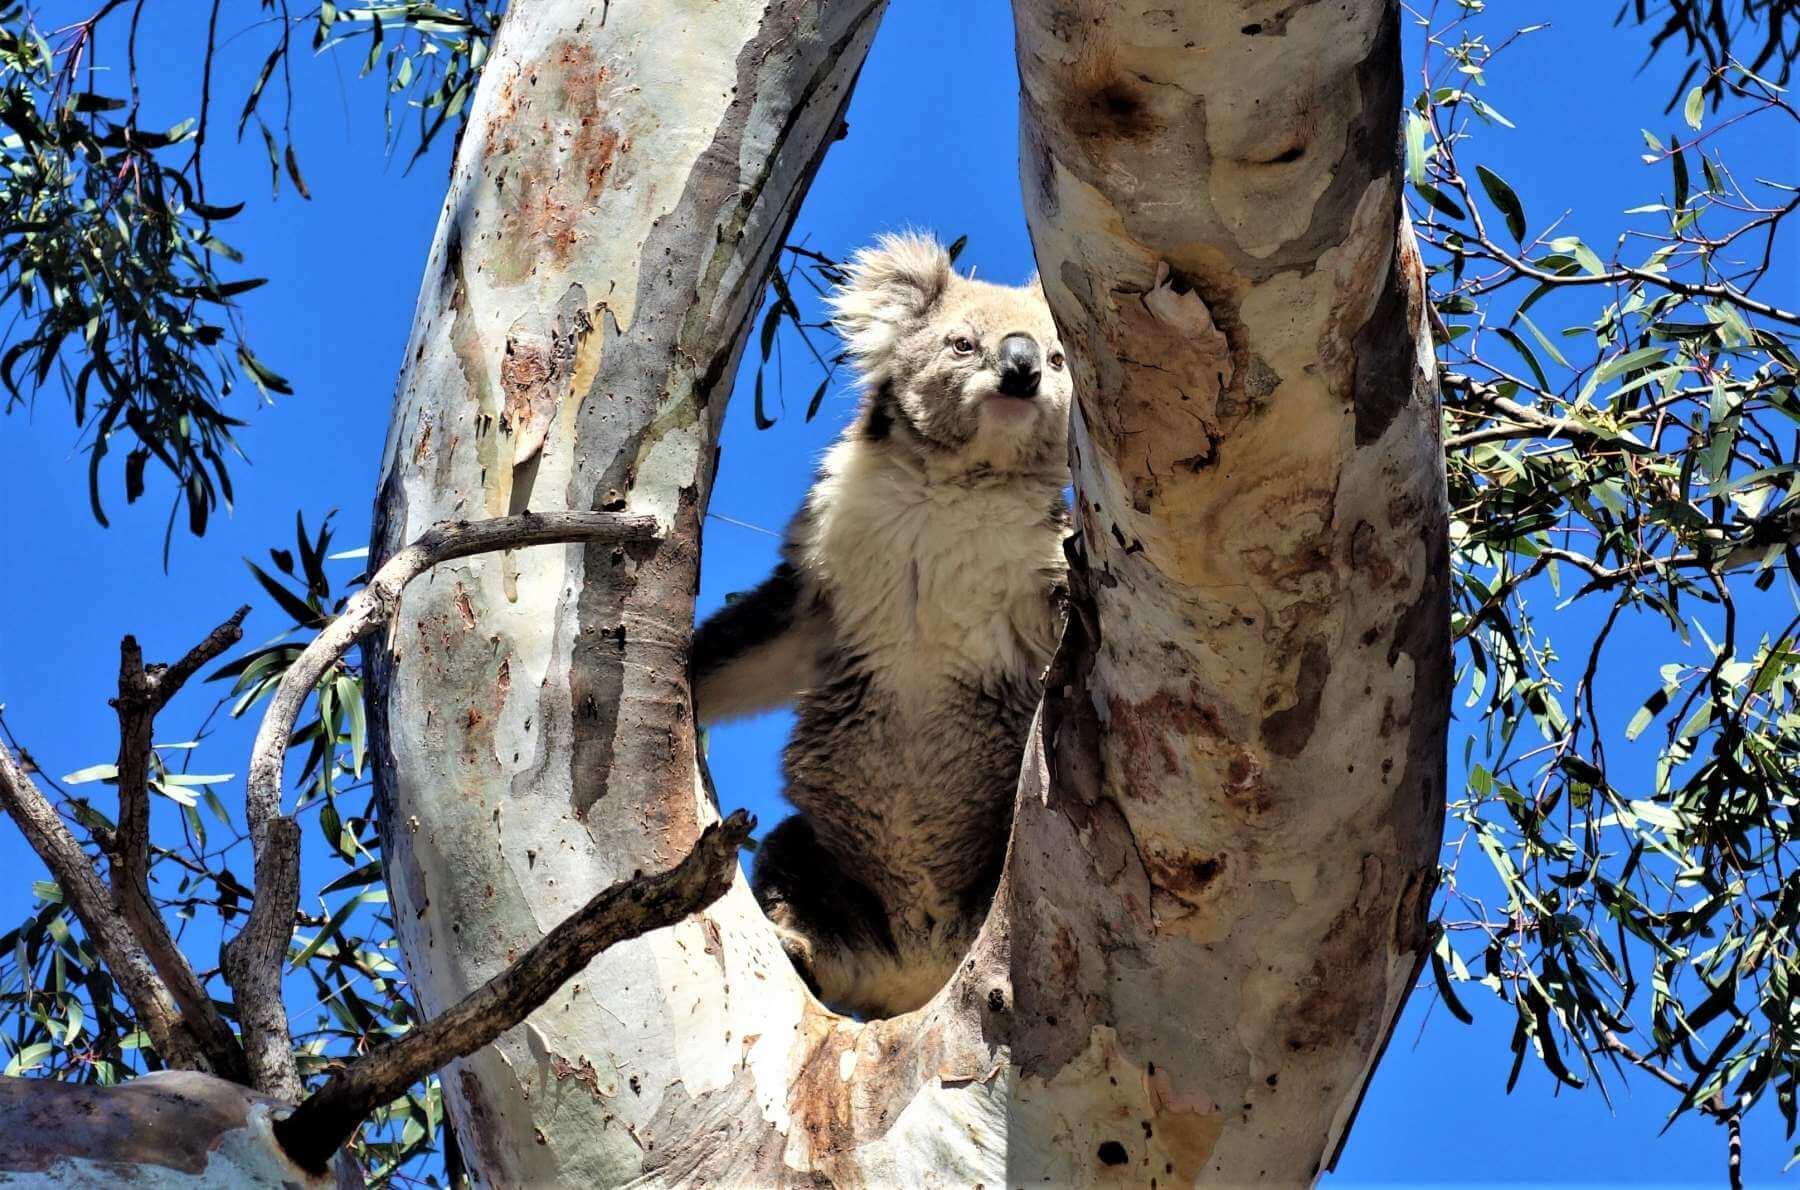 Koalas in Australien - Raymond Island